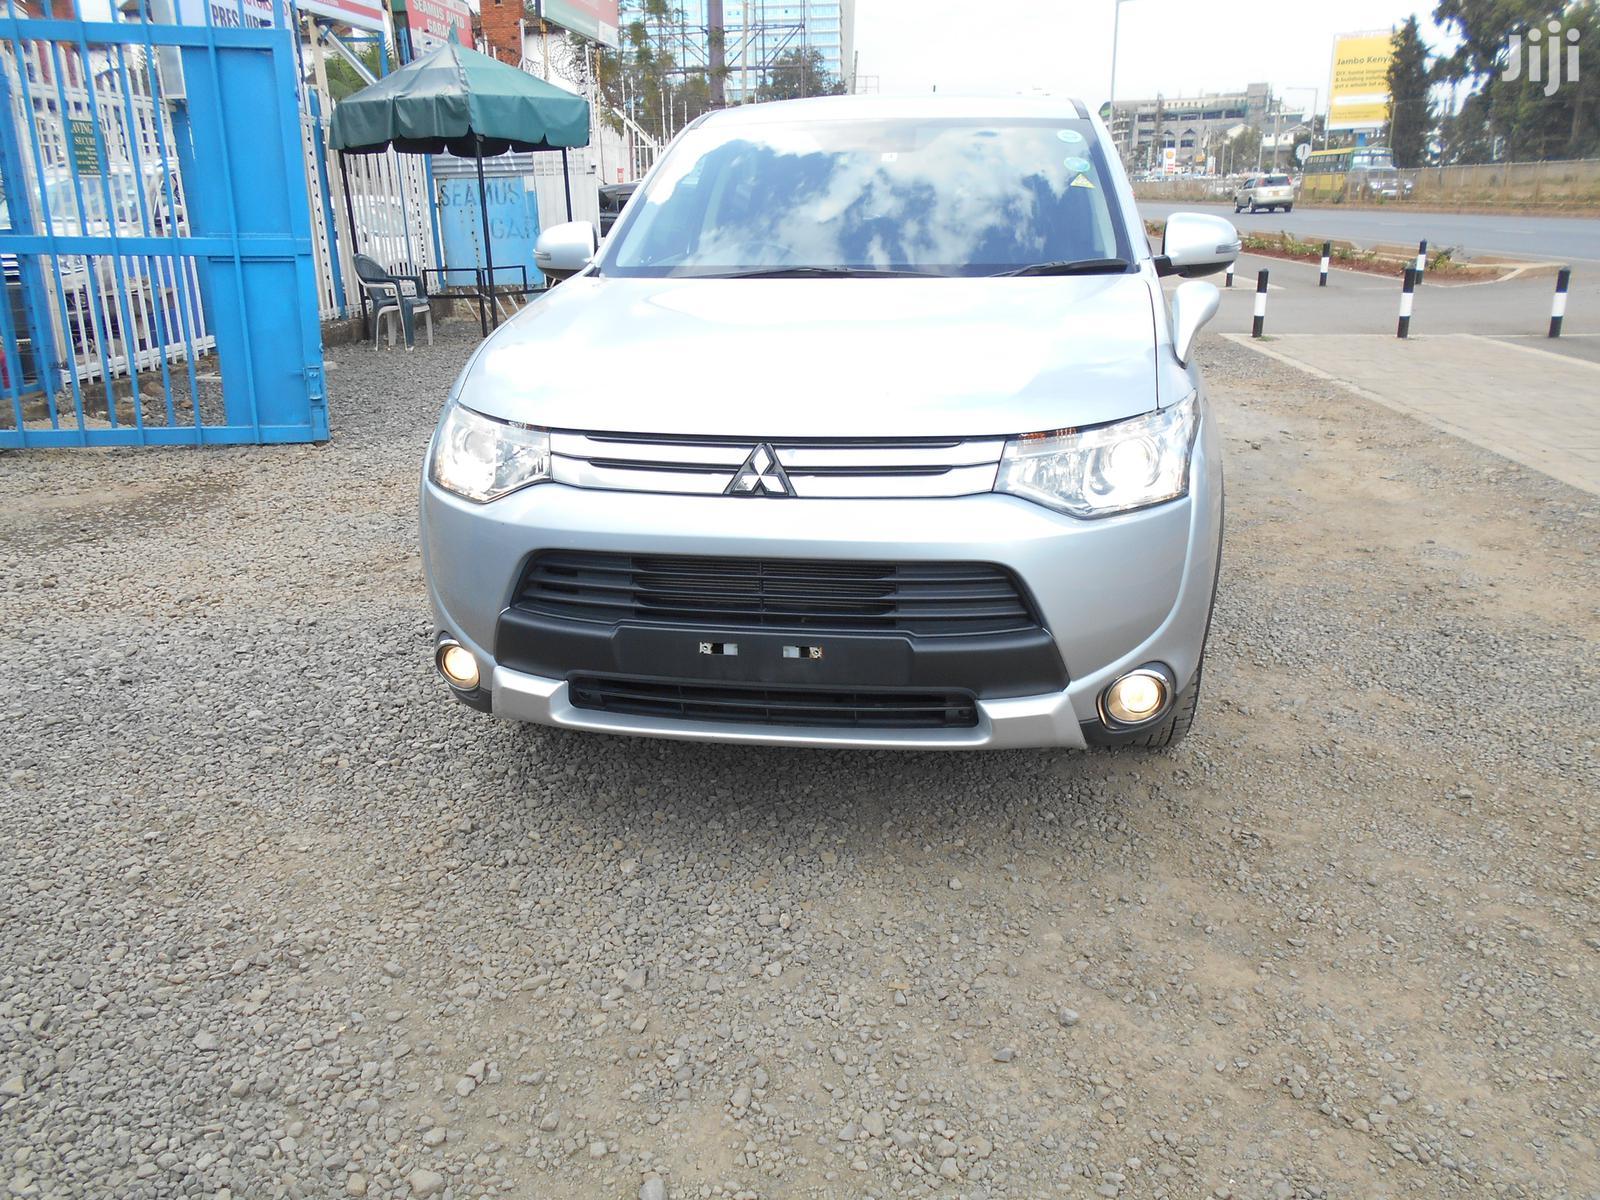 Mitsubishi Outlander 2014 Silver | Cars for sale in Kilimani, Nairobi, Kenya